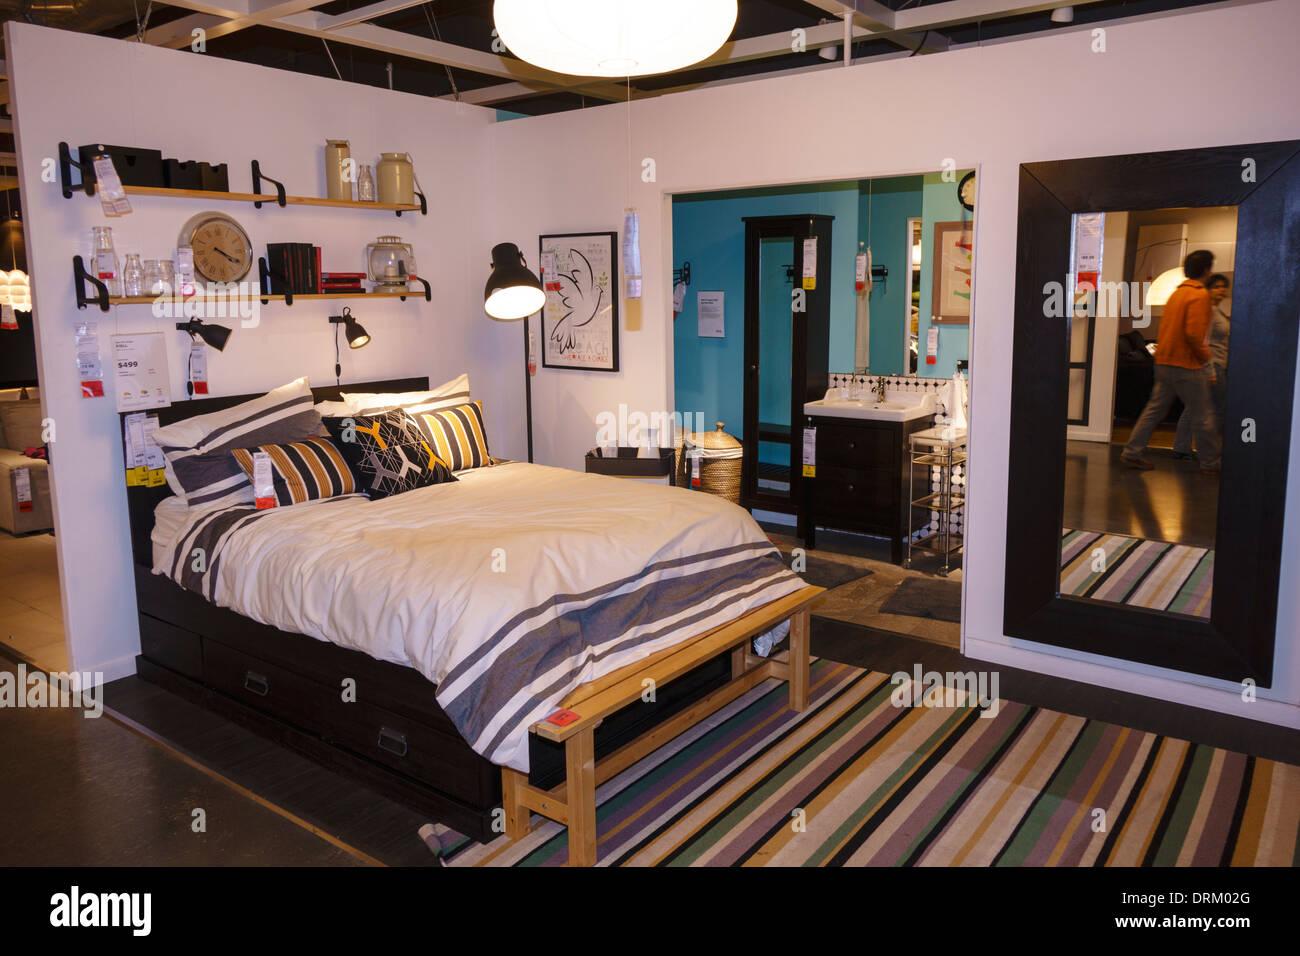 Ikea Shop Shops Stockfotos & Ikea Shop Shops Bilder - Alamy